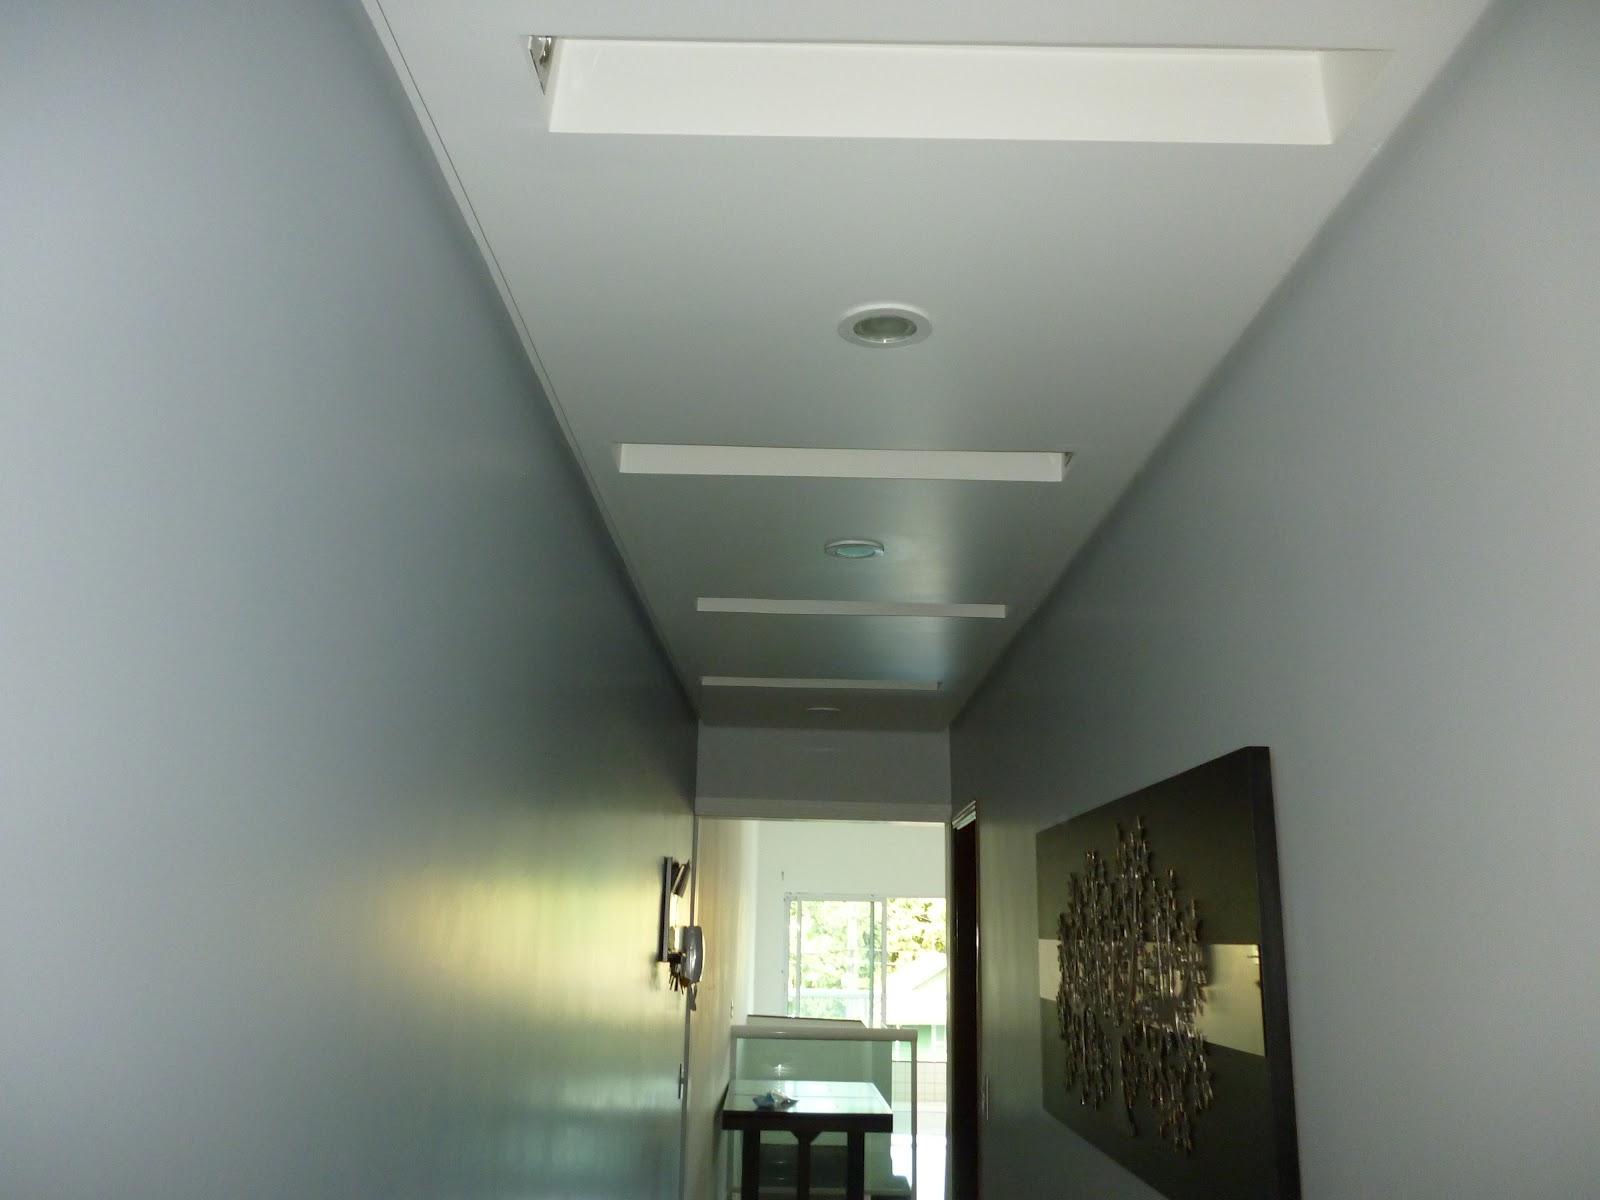 Pintura limpa Corredor de acesso aos quartos Pintado na  ~ Quarto Pintado Branco Gelo